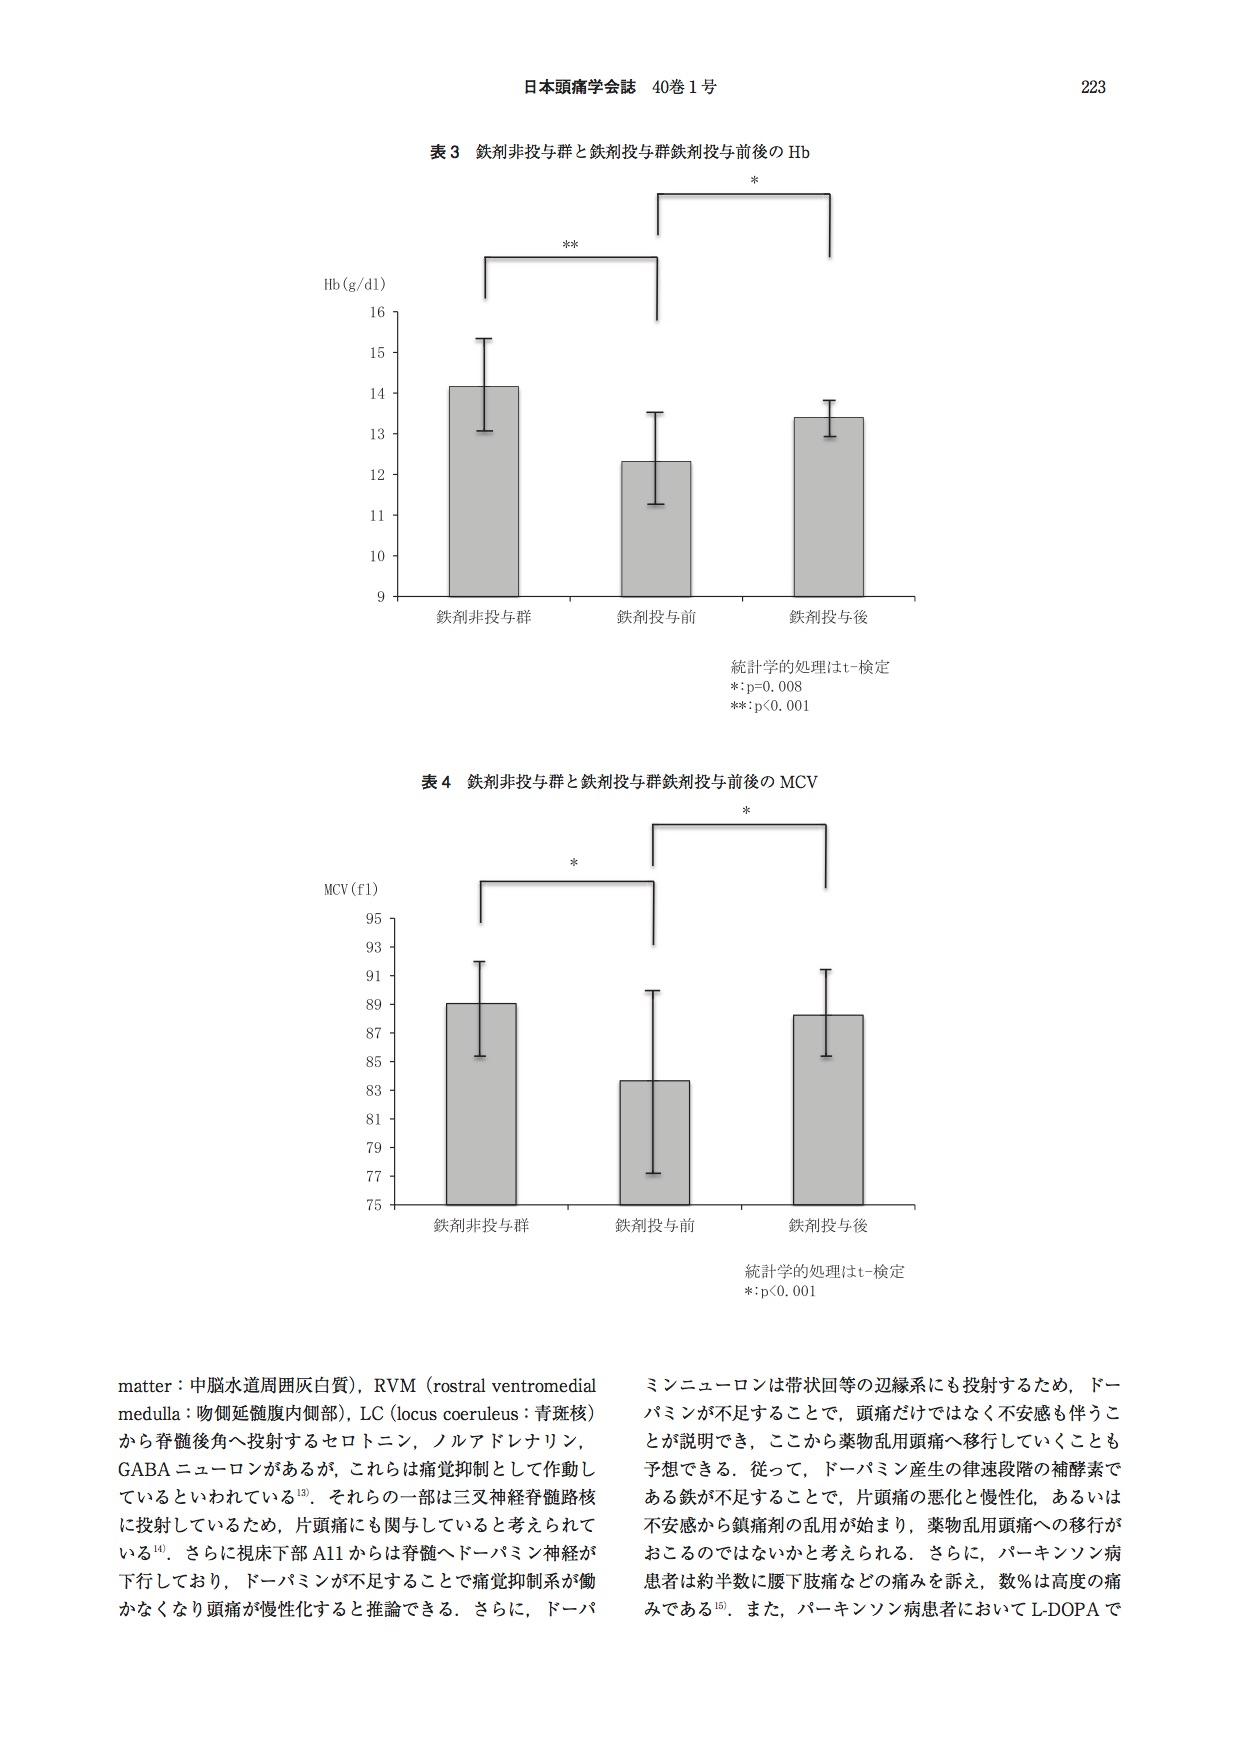 2013_40_no1.鉄剤投与pdf-3.jpg